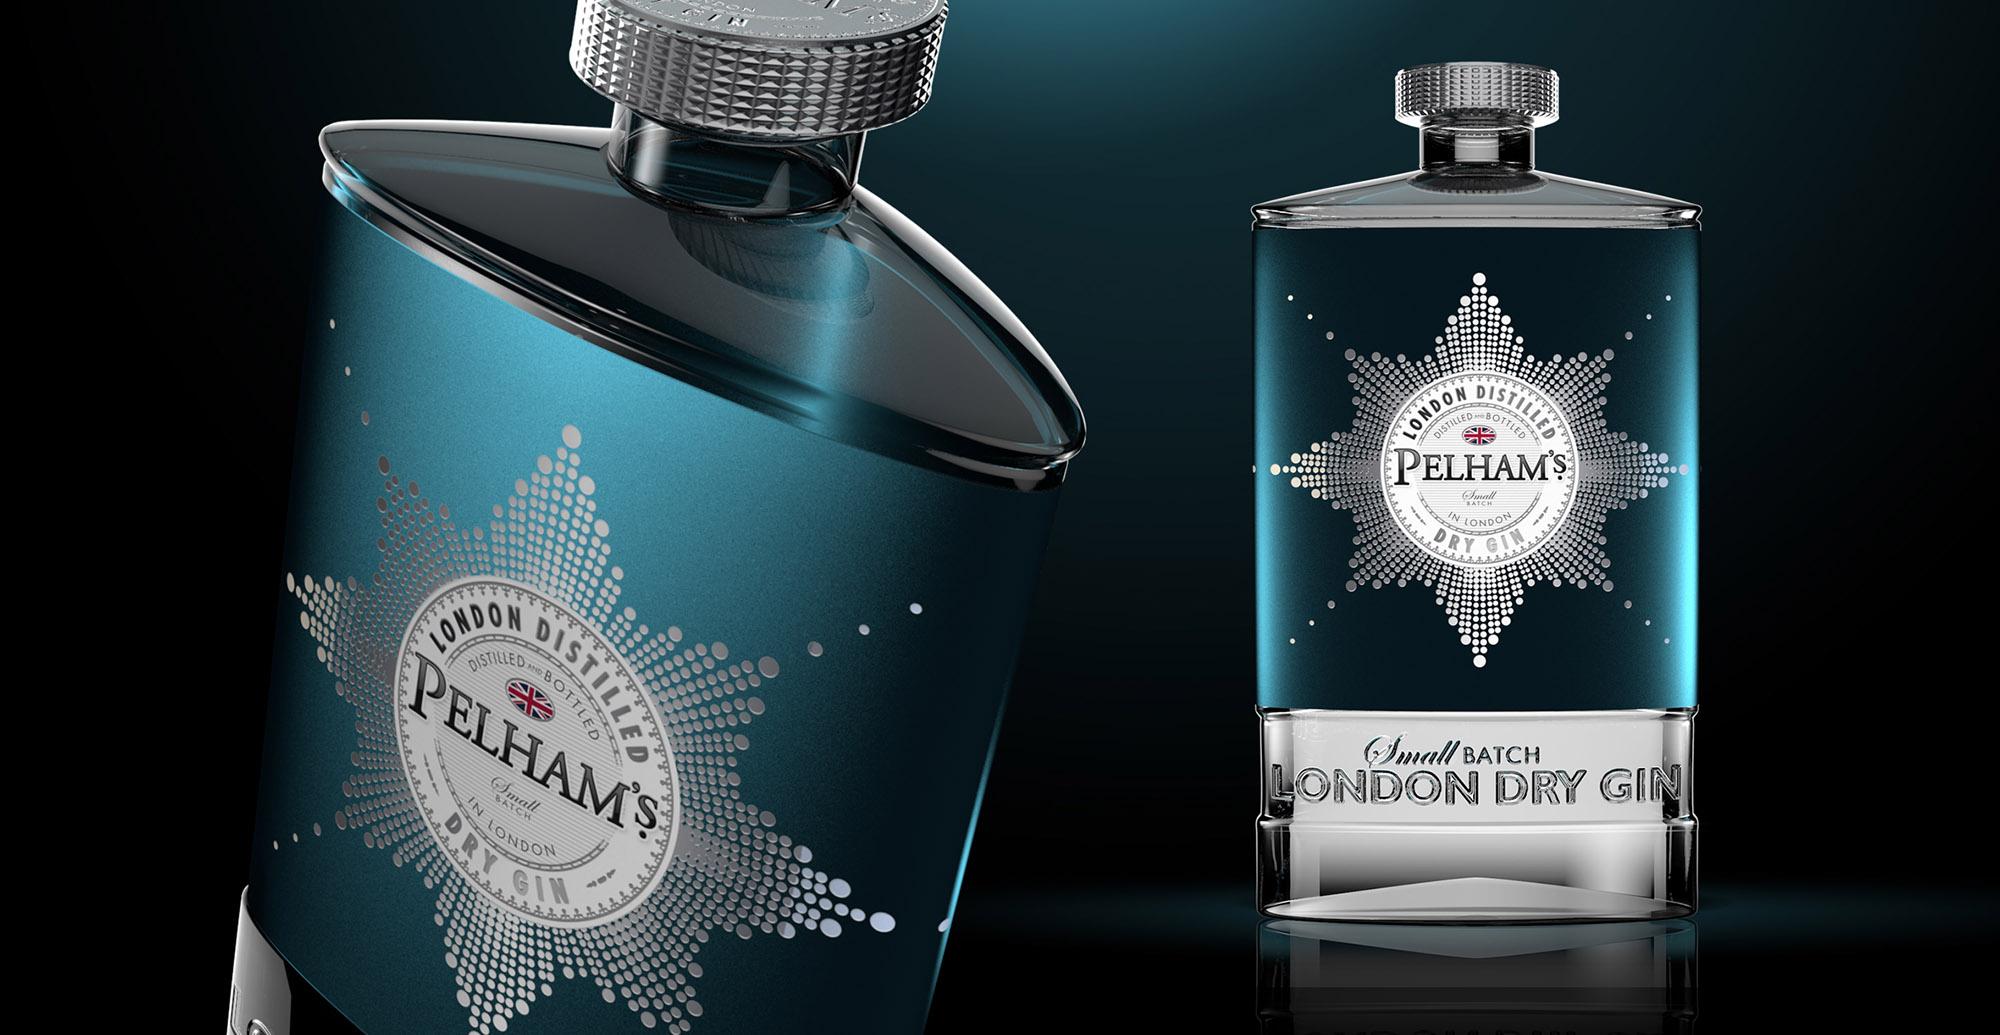 Branding and Packaging Design forPremium Gin Brand Pelham's - 3D Packaging Render